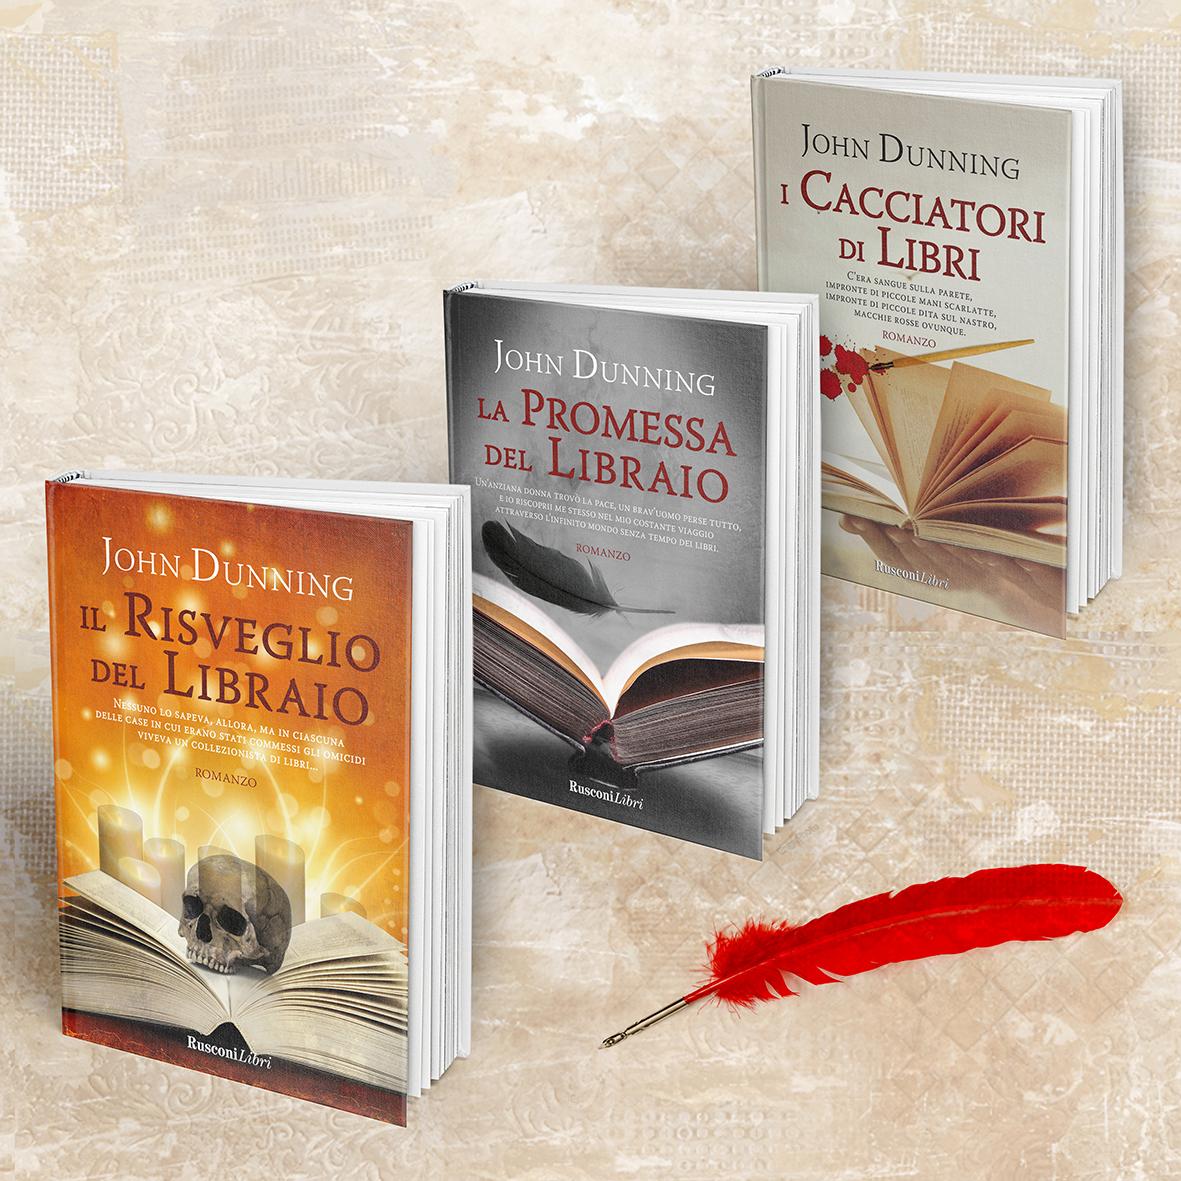 Rusconi-libri-collana-dunning